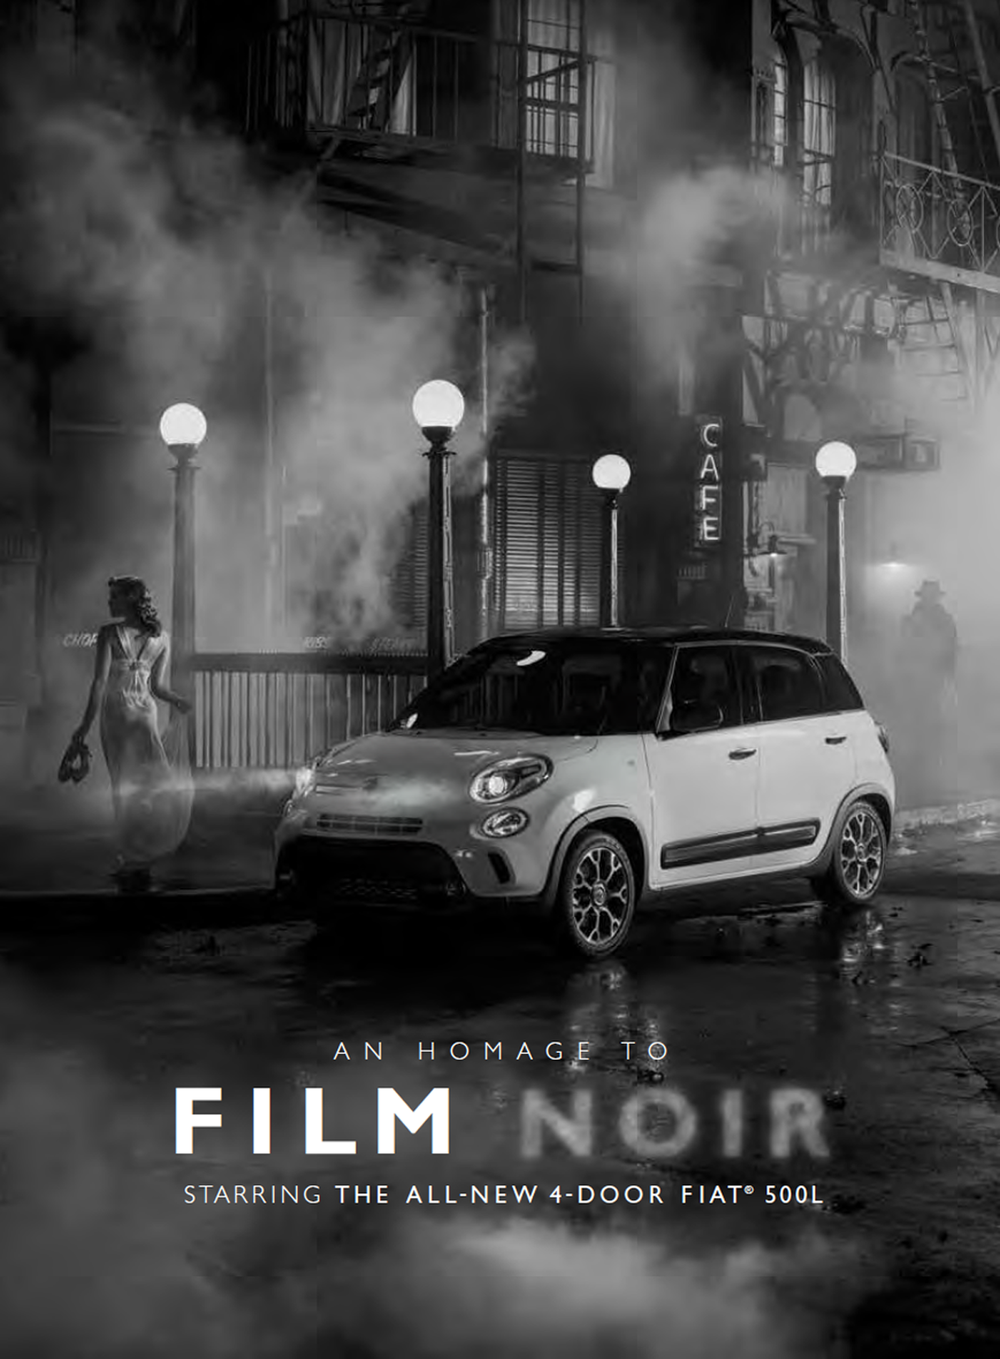 film-noir-big4.png